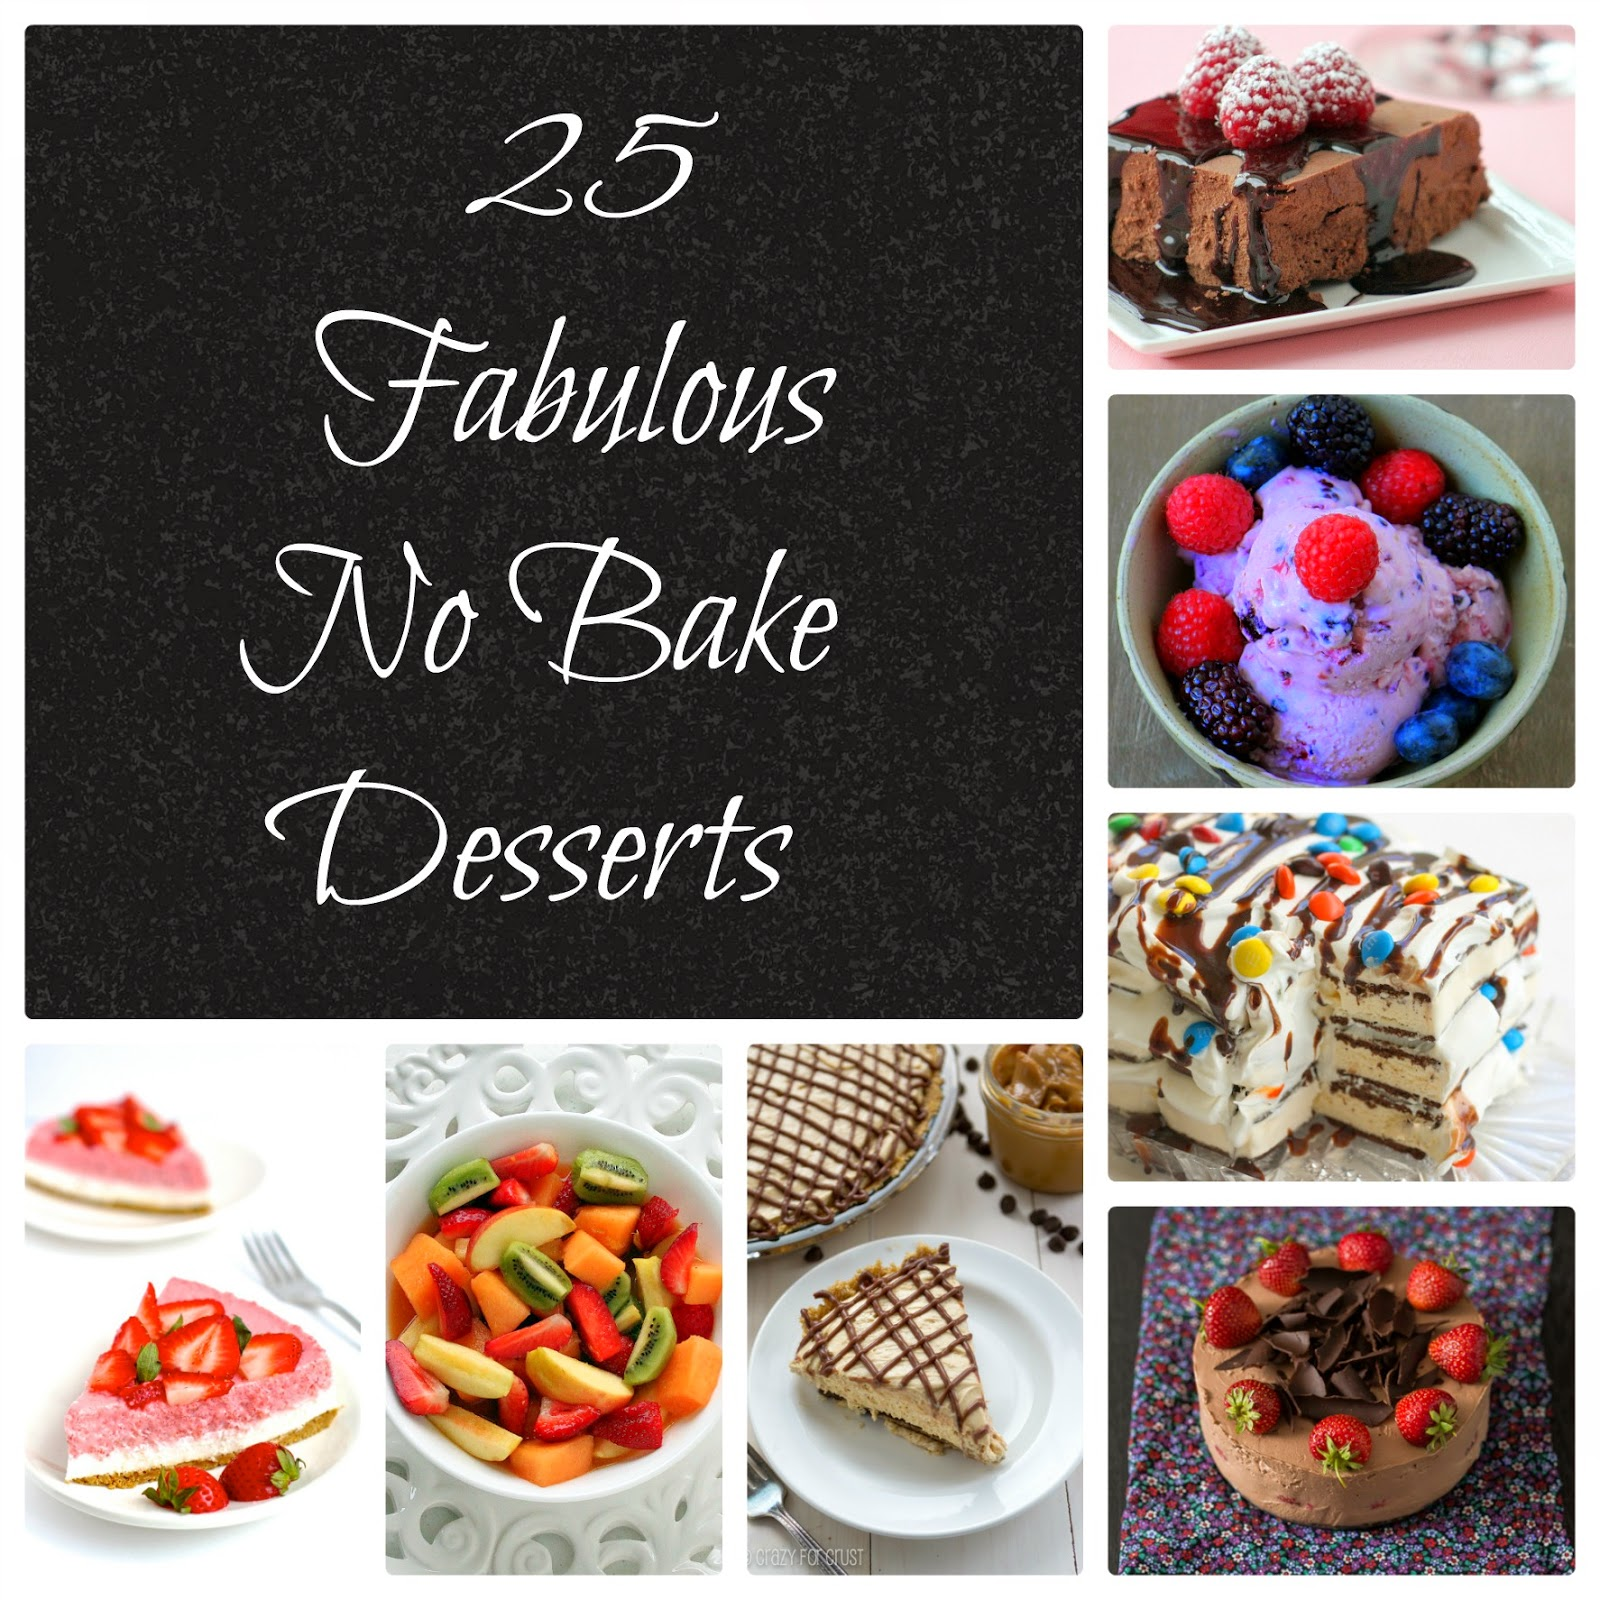 25 Fabulous No Bake Desserts